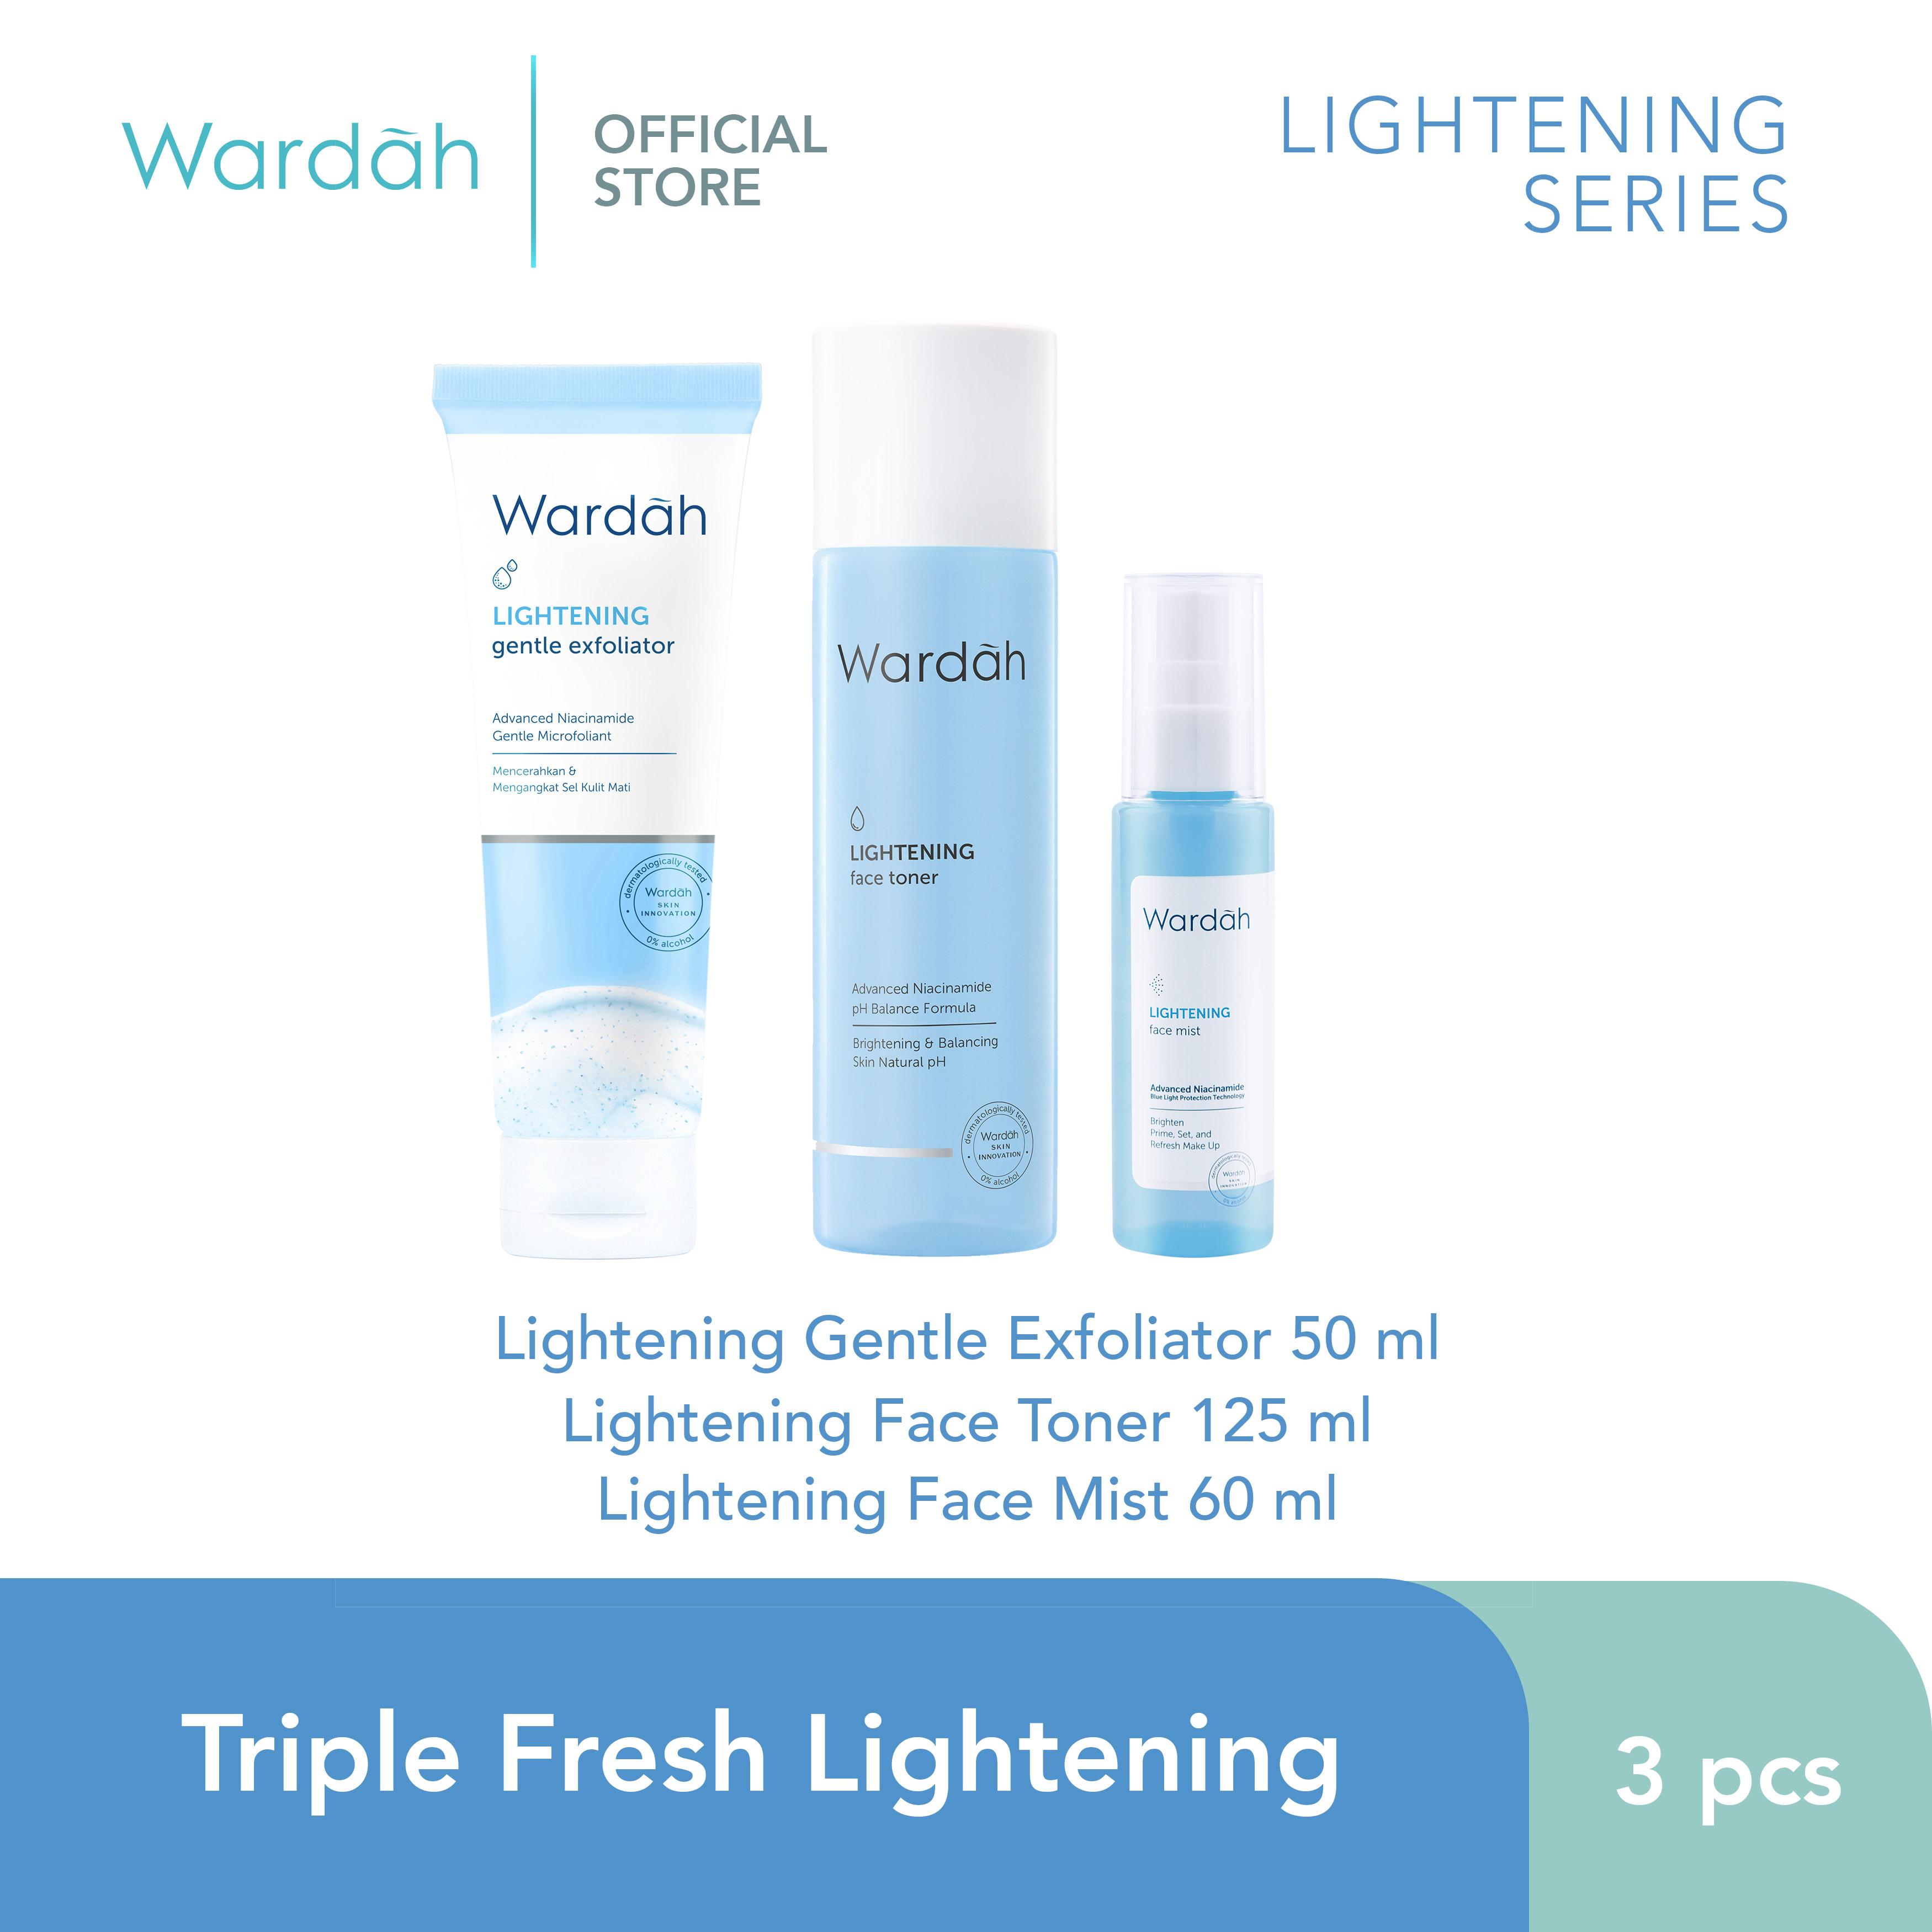 Triple Fresh Lightening